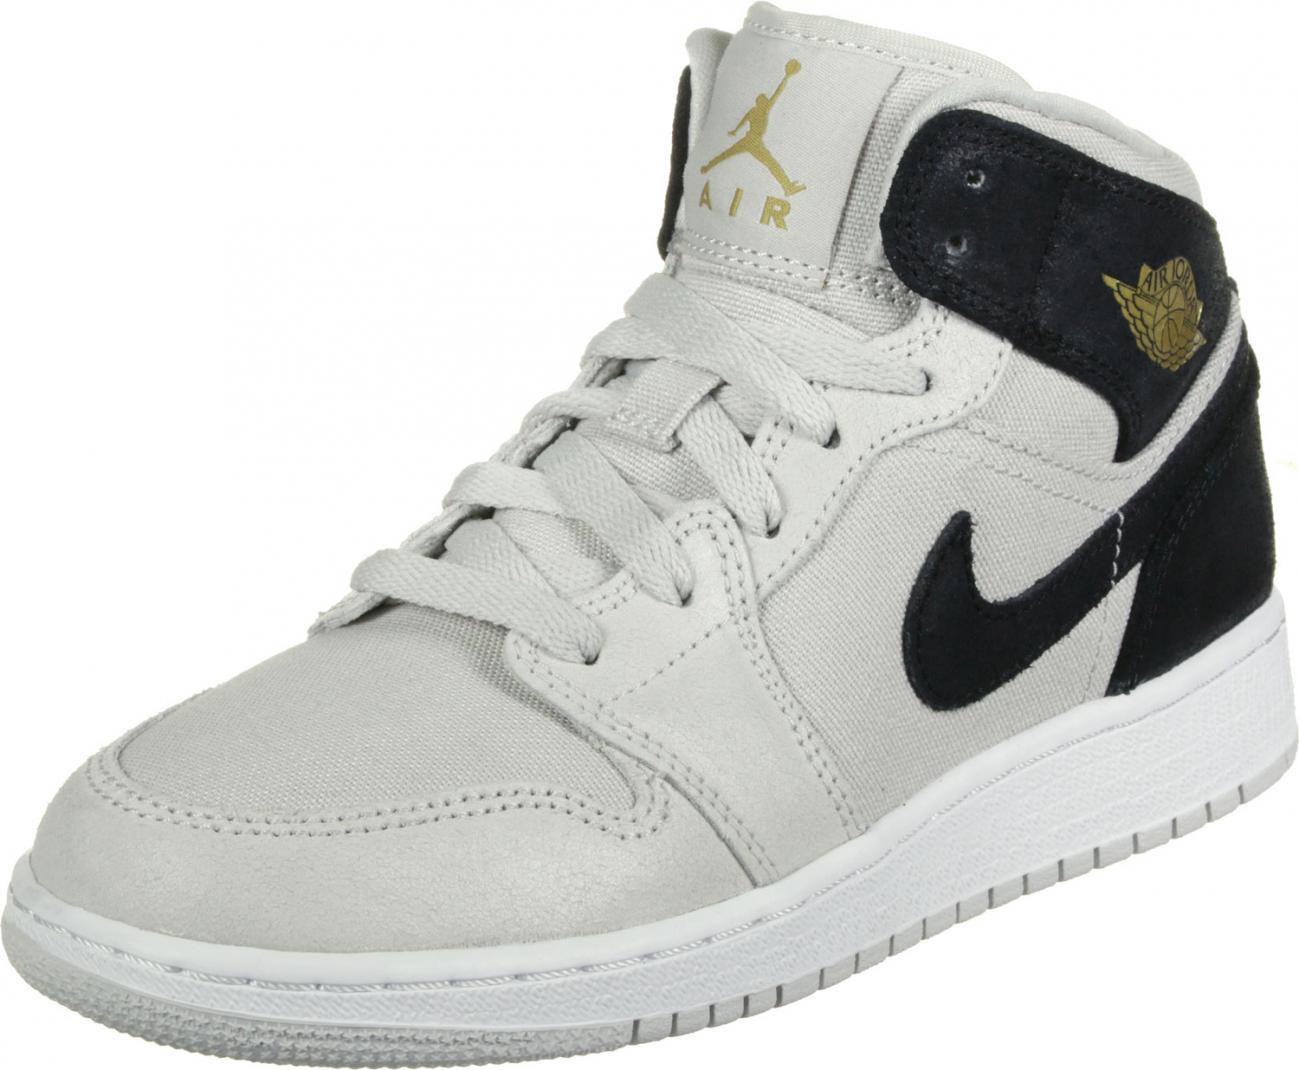 Air Jordan 1 Femme Gris - Jordan 1 Mid GS chaussures gris noir < Nyima